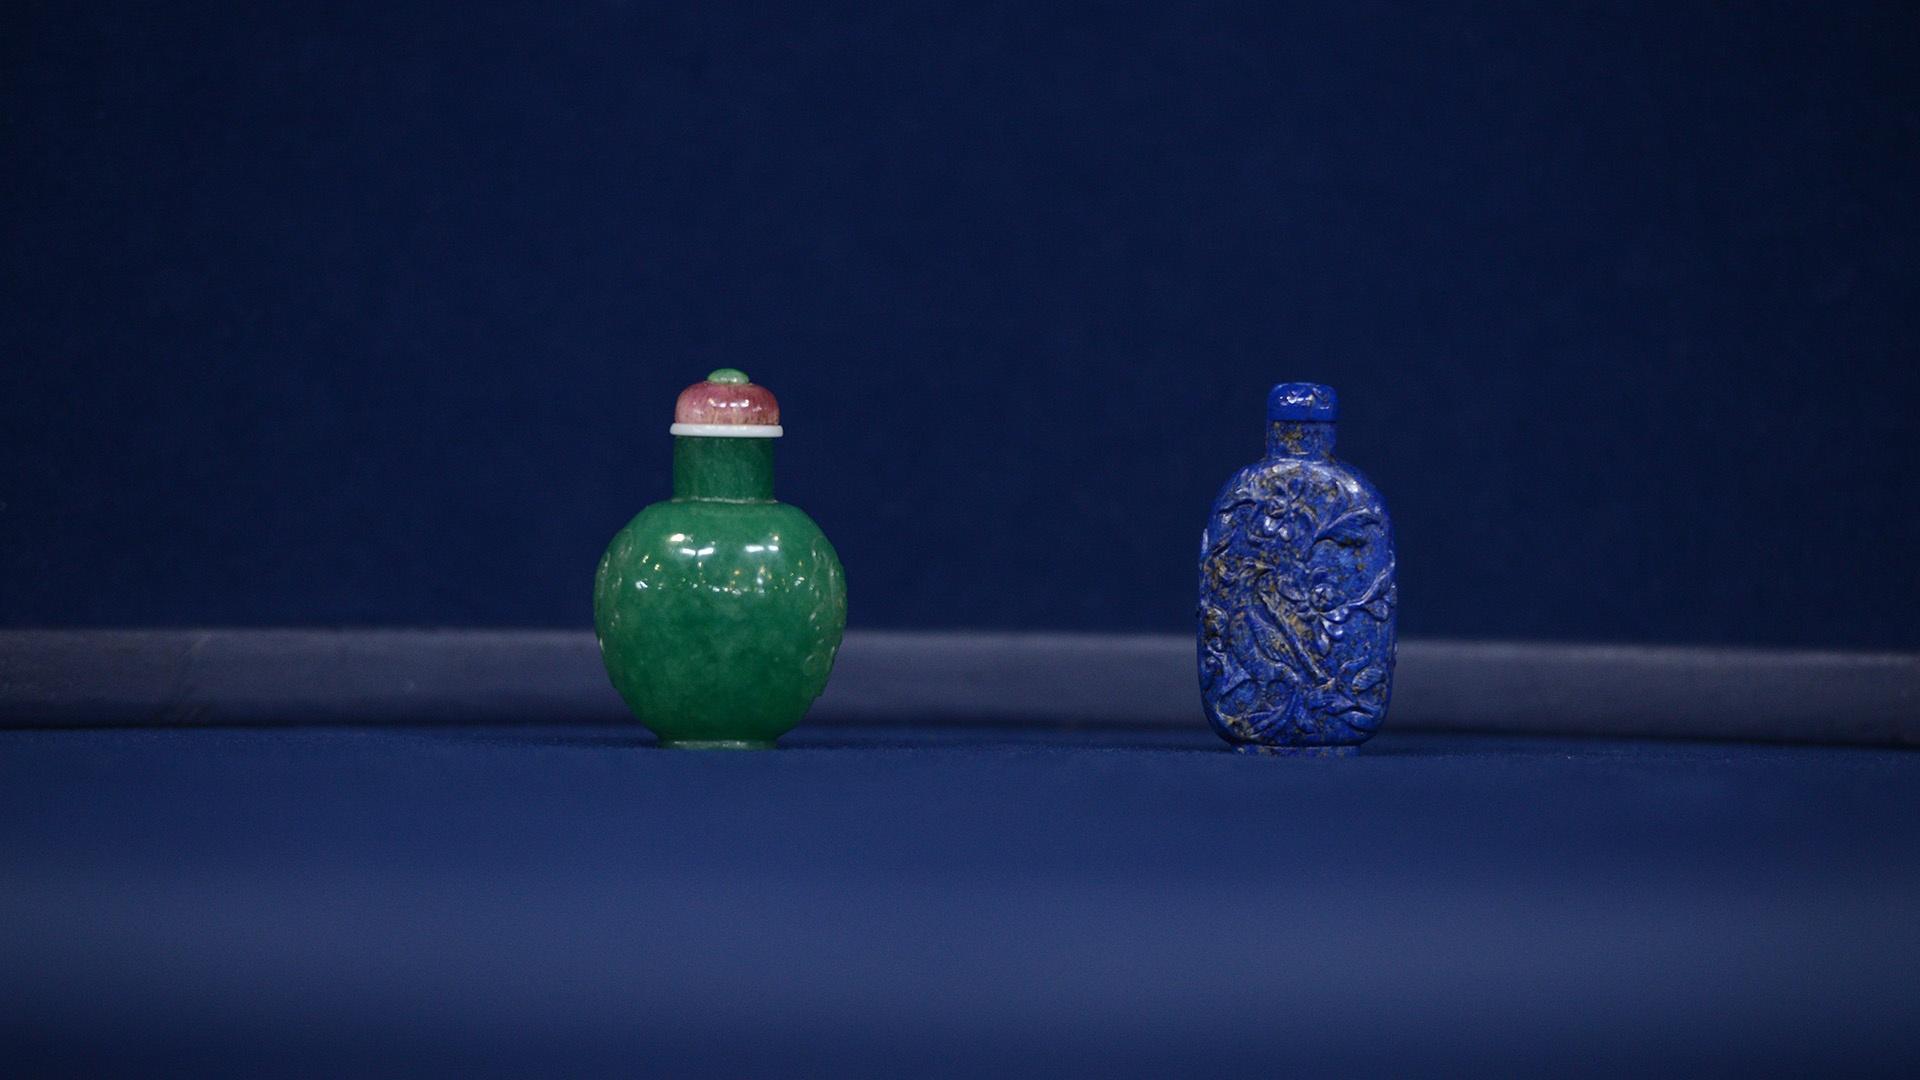 Antiques Roadshow - Appraisal: Lapiz Lazuli & Imperial Jade Snuff Bottles - Twin Cities PBS